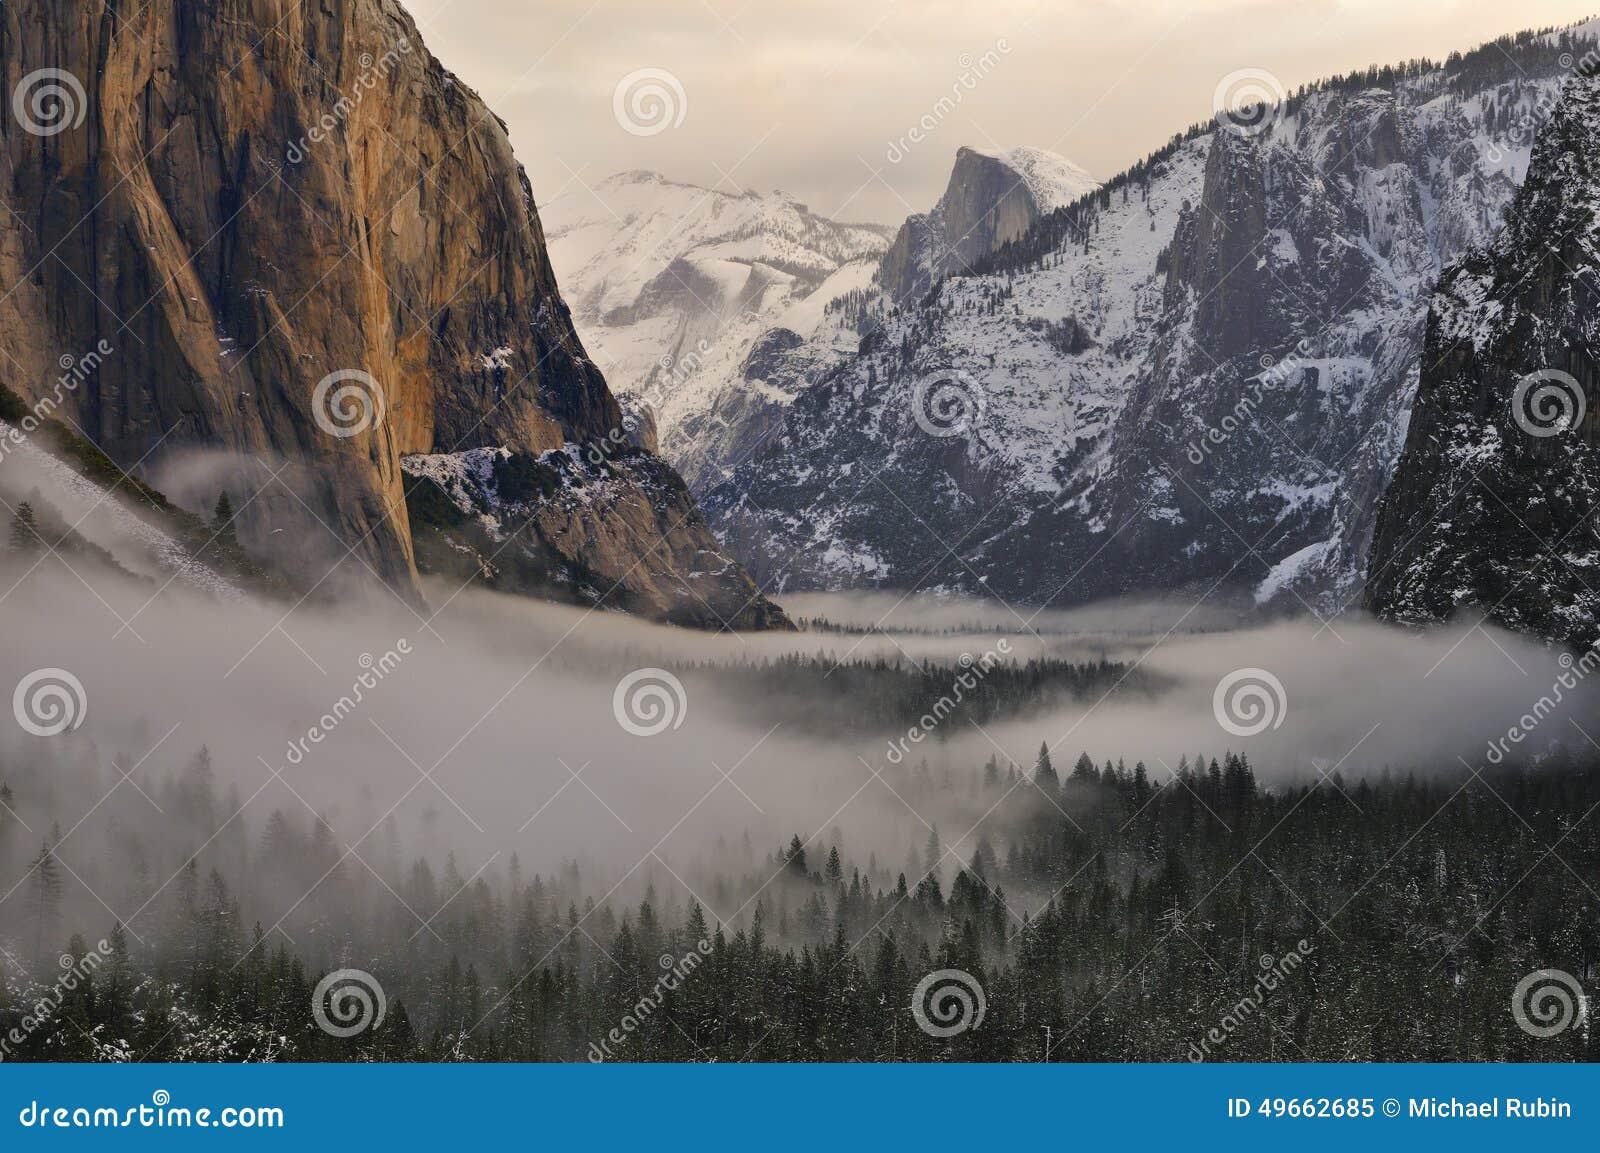 el capitan and half dome over foggy valley, yosemite national park